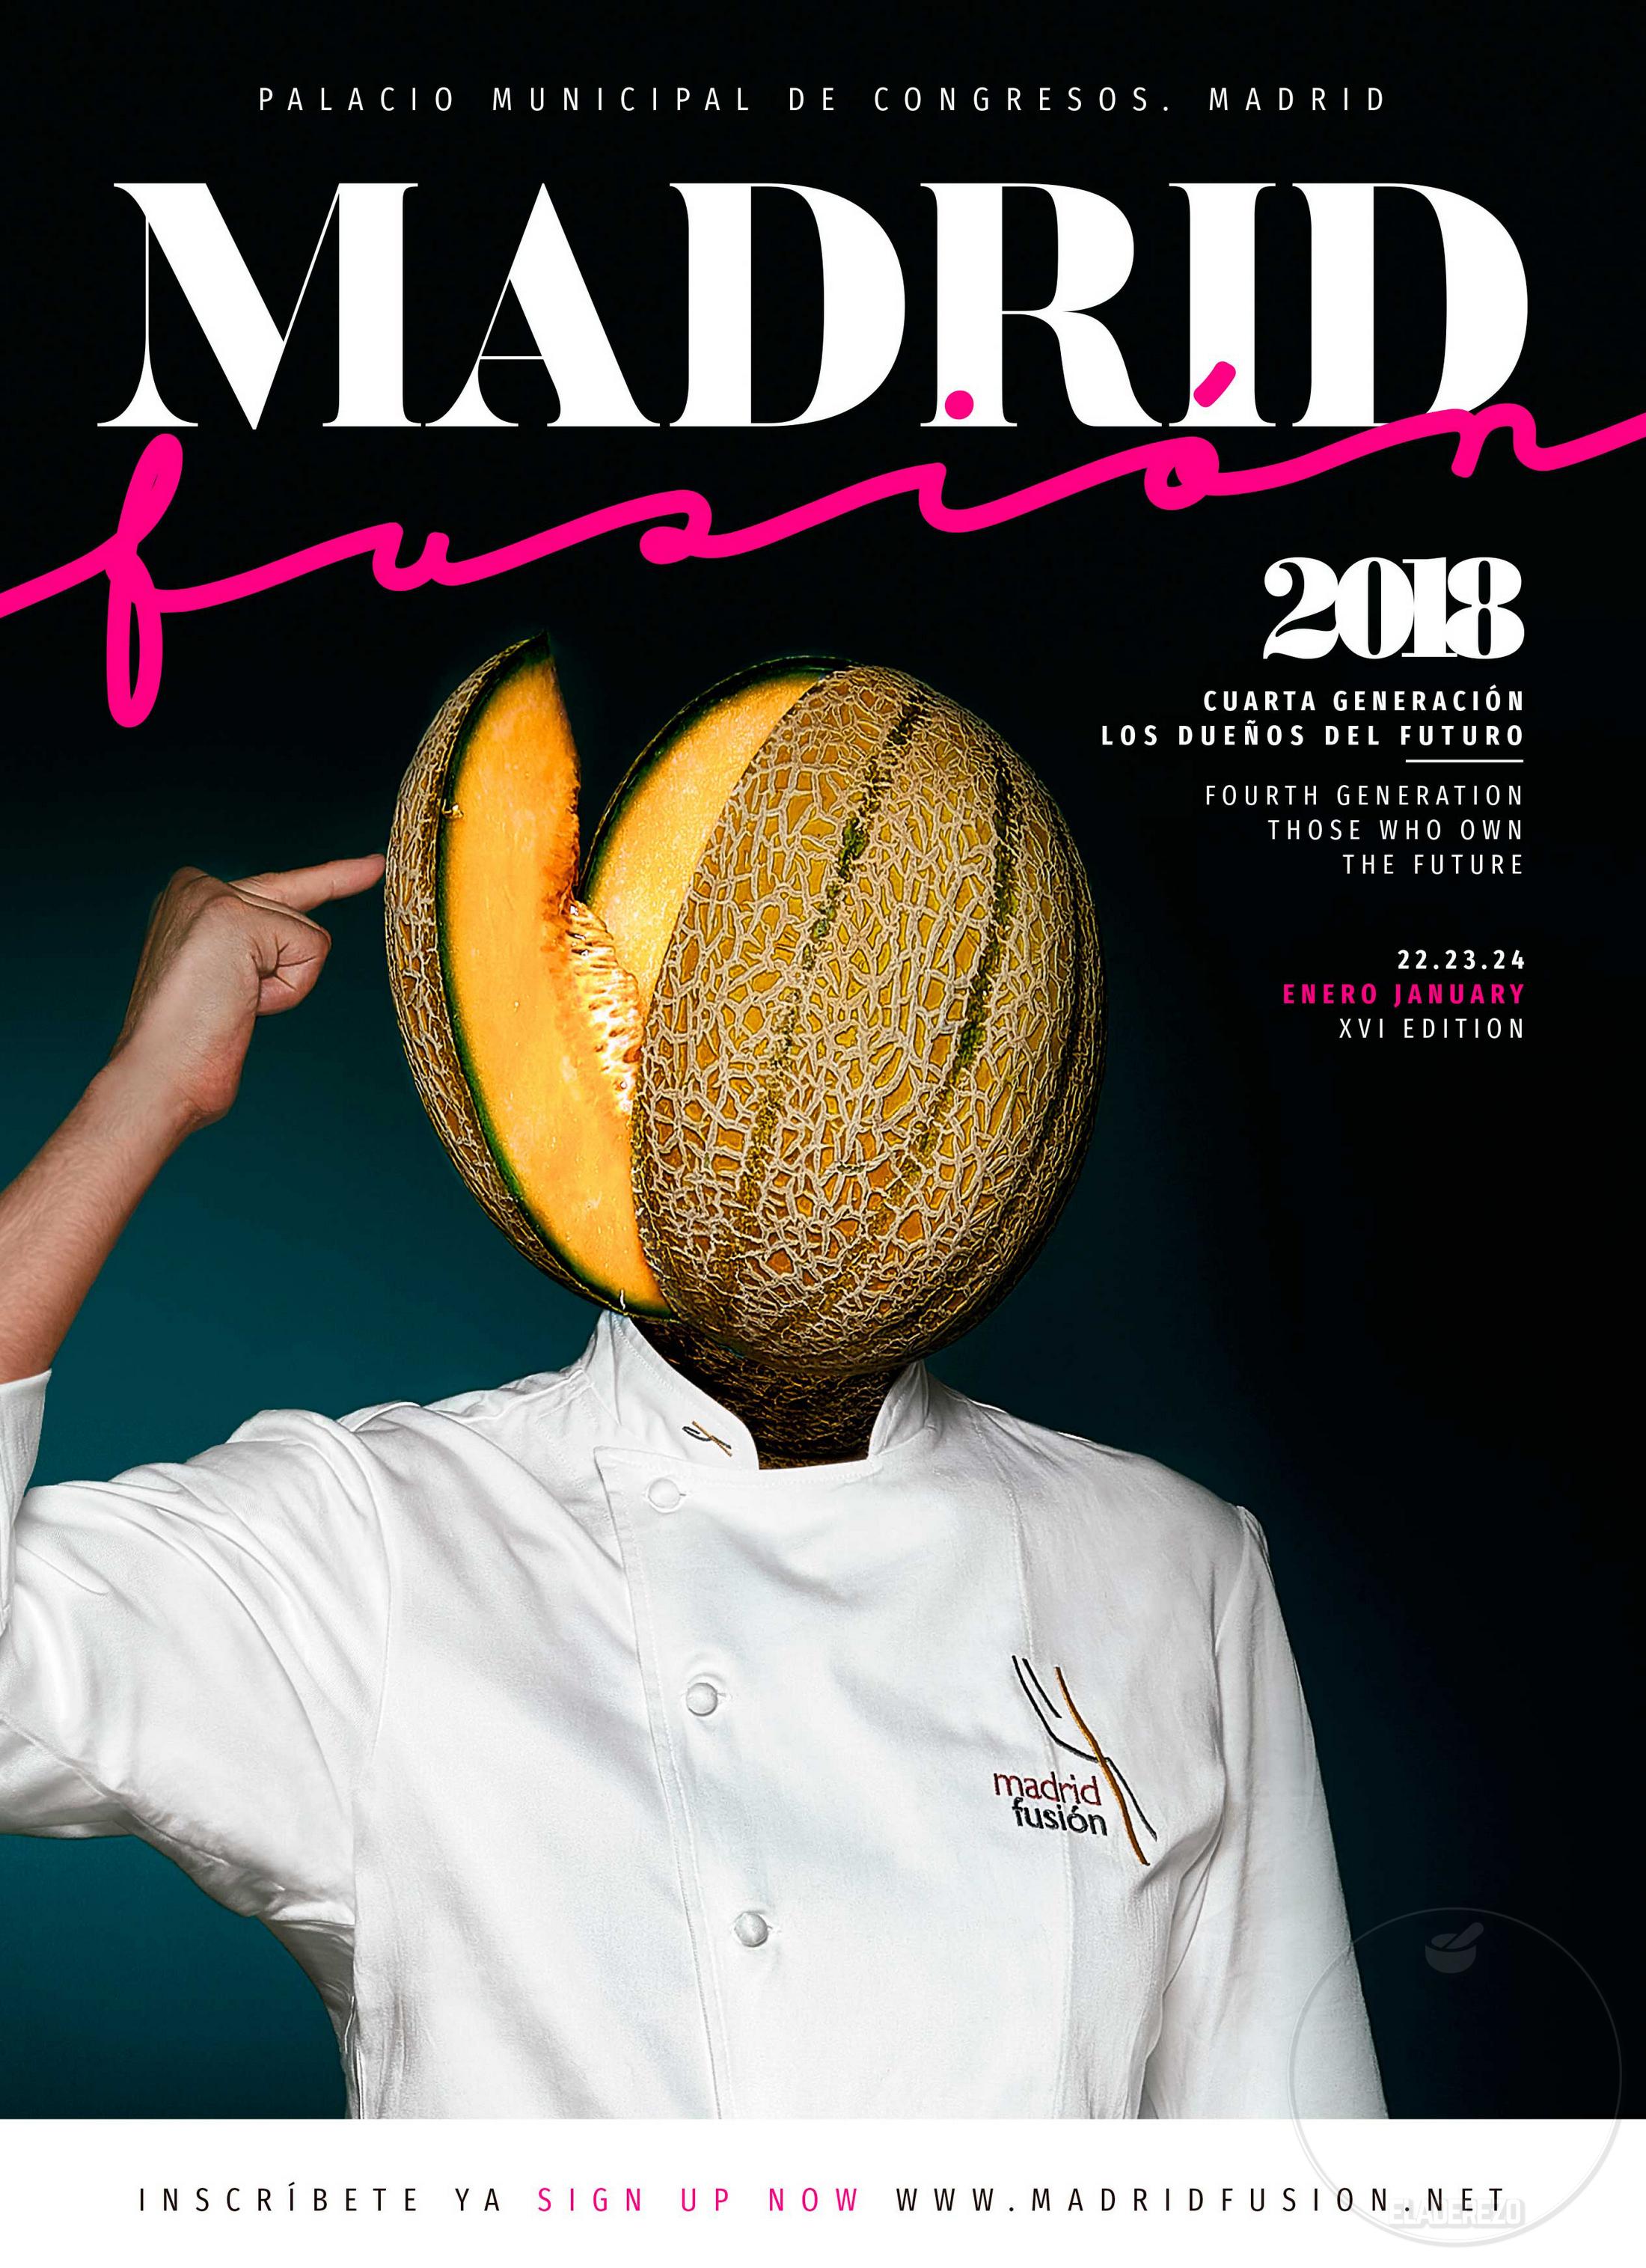 Madrid fusi n 2018 programa - Cursos de cocina sabadell ...